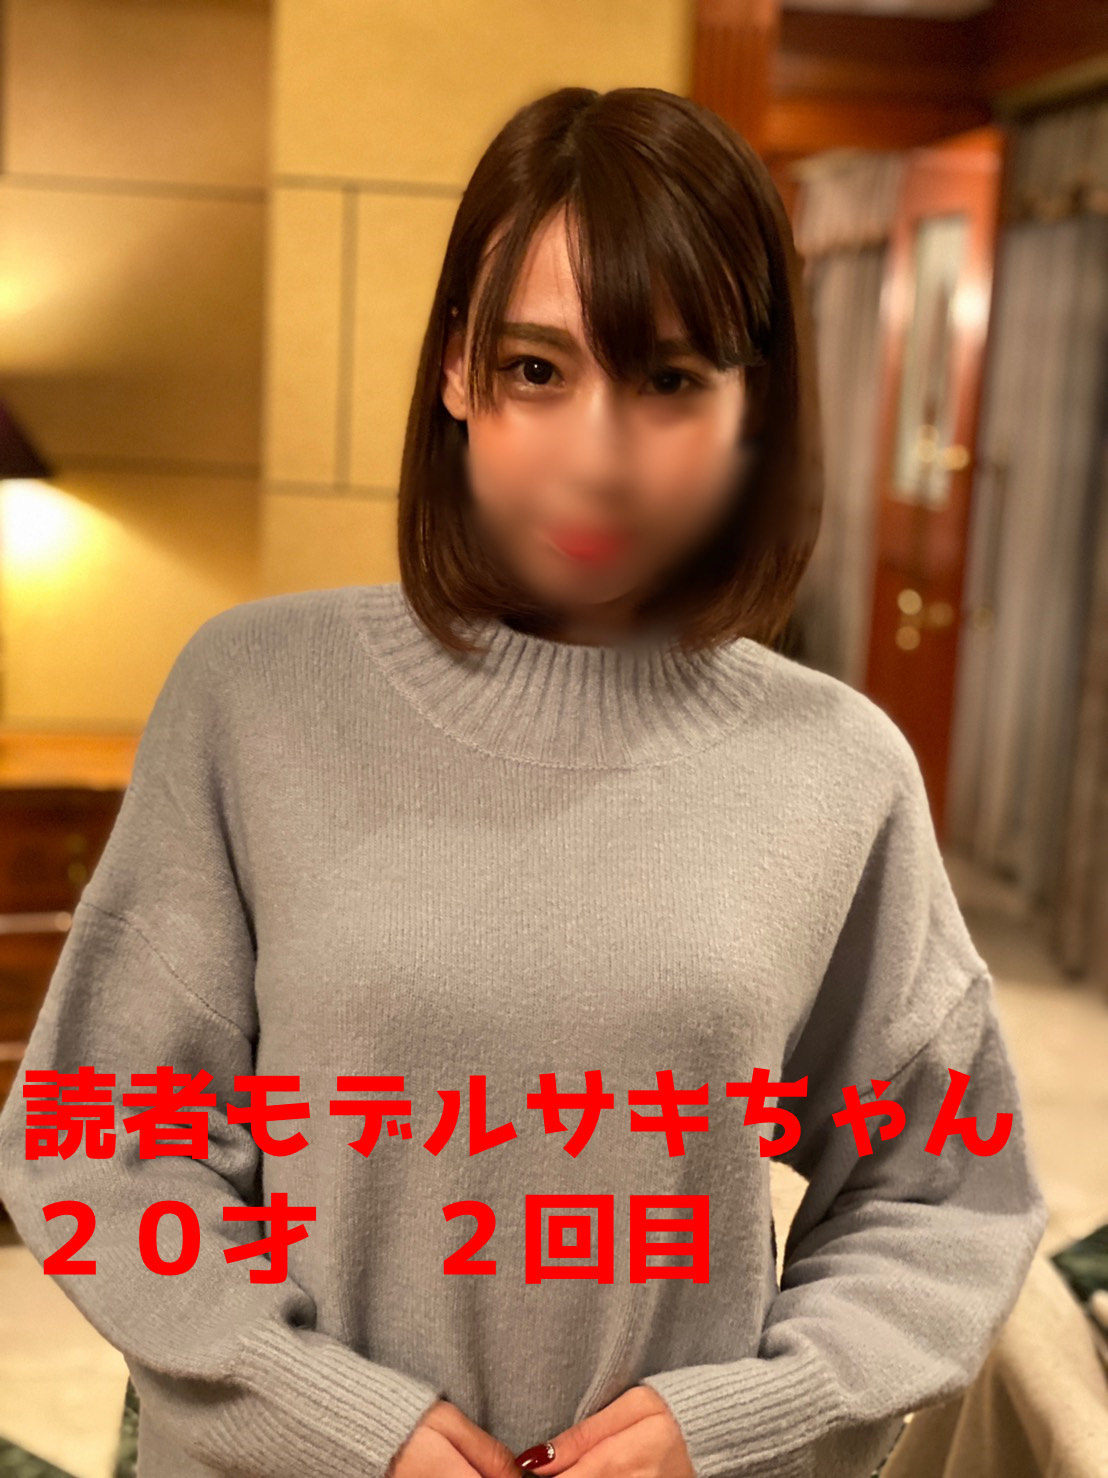 FC2 PPV 1668575 「素人撮影」関西読者モデルサキちゃん20歳2回目 休んでるとこやっちゃいました(^^)/